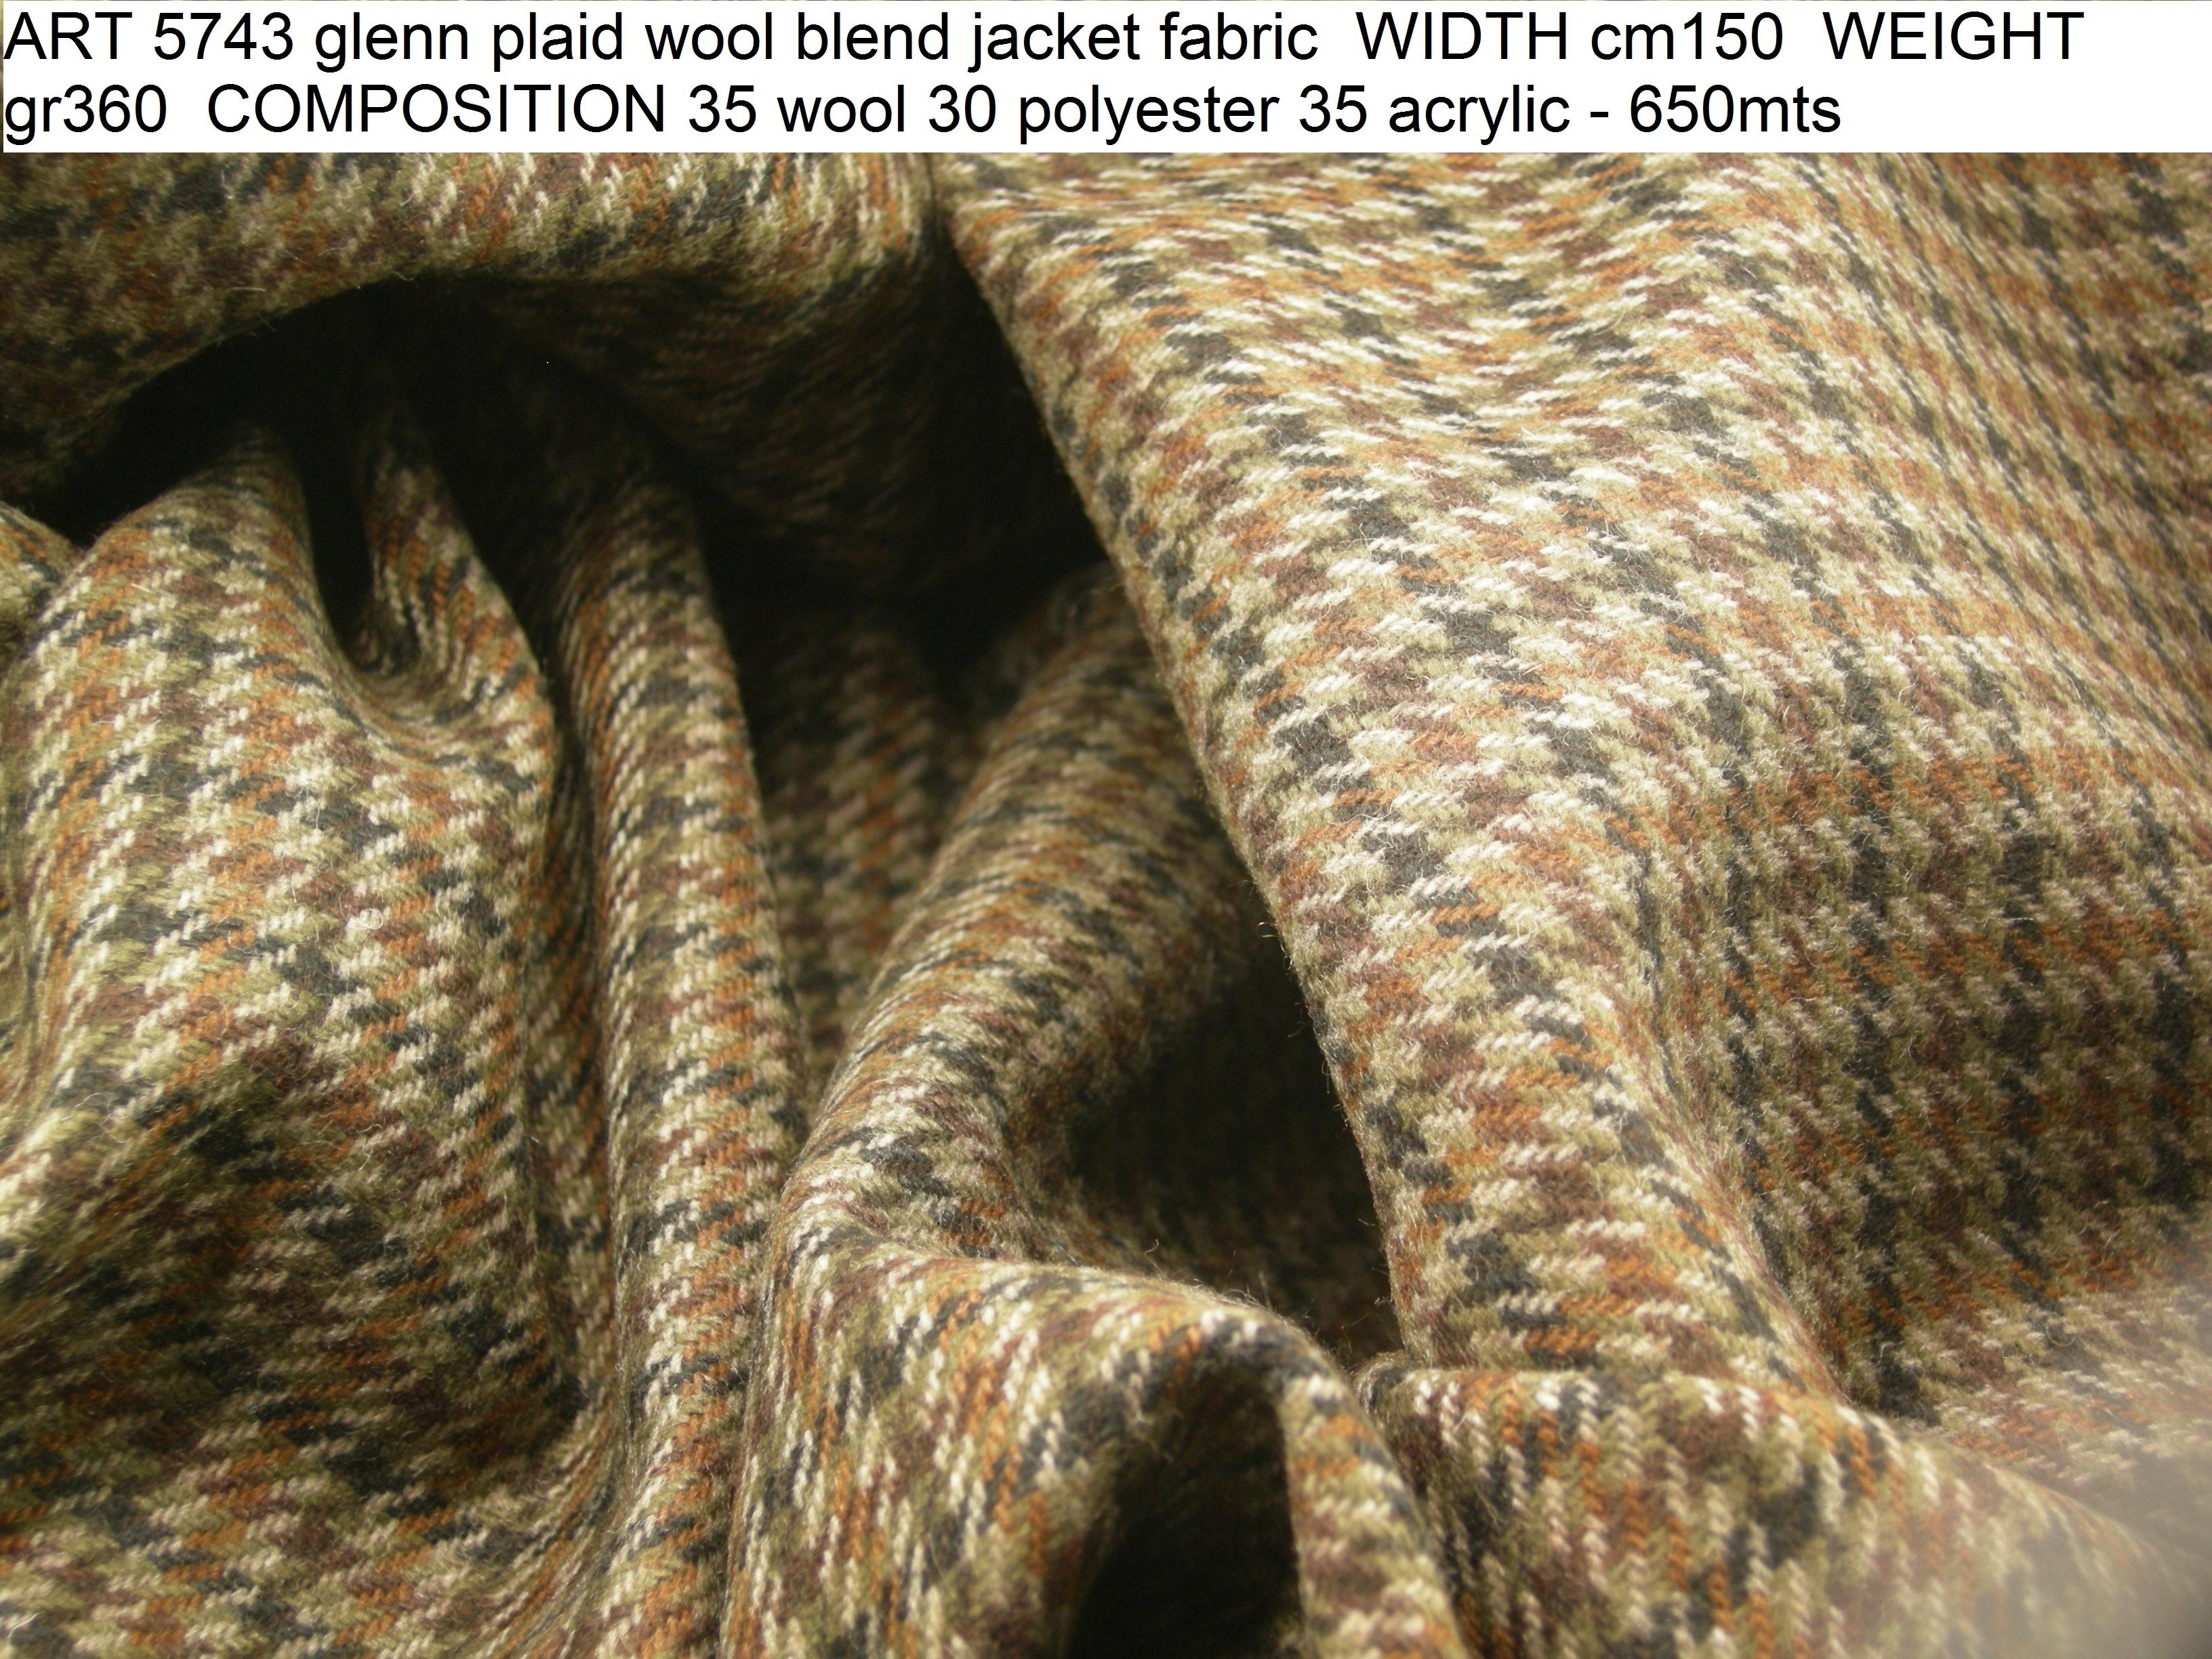 ART 5743 glenn plaid wool blend jacket fabric WIDTH cm150 WEIGHT gr360 COMPOSITION 35 wool 30 polyester 35 acrylic - 650mts